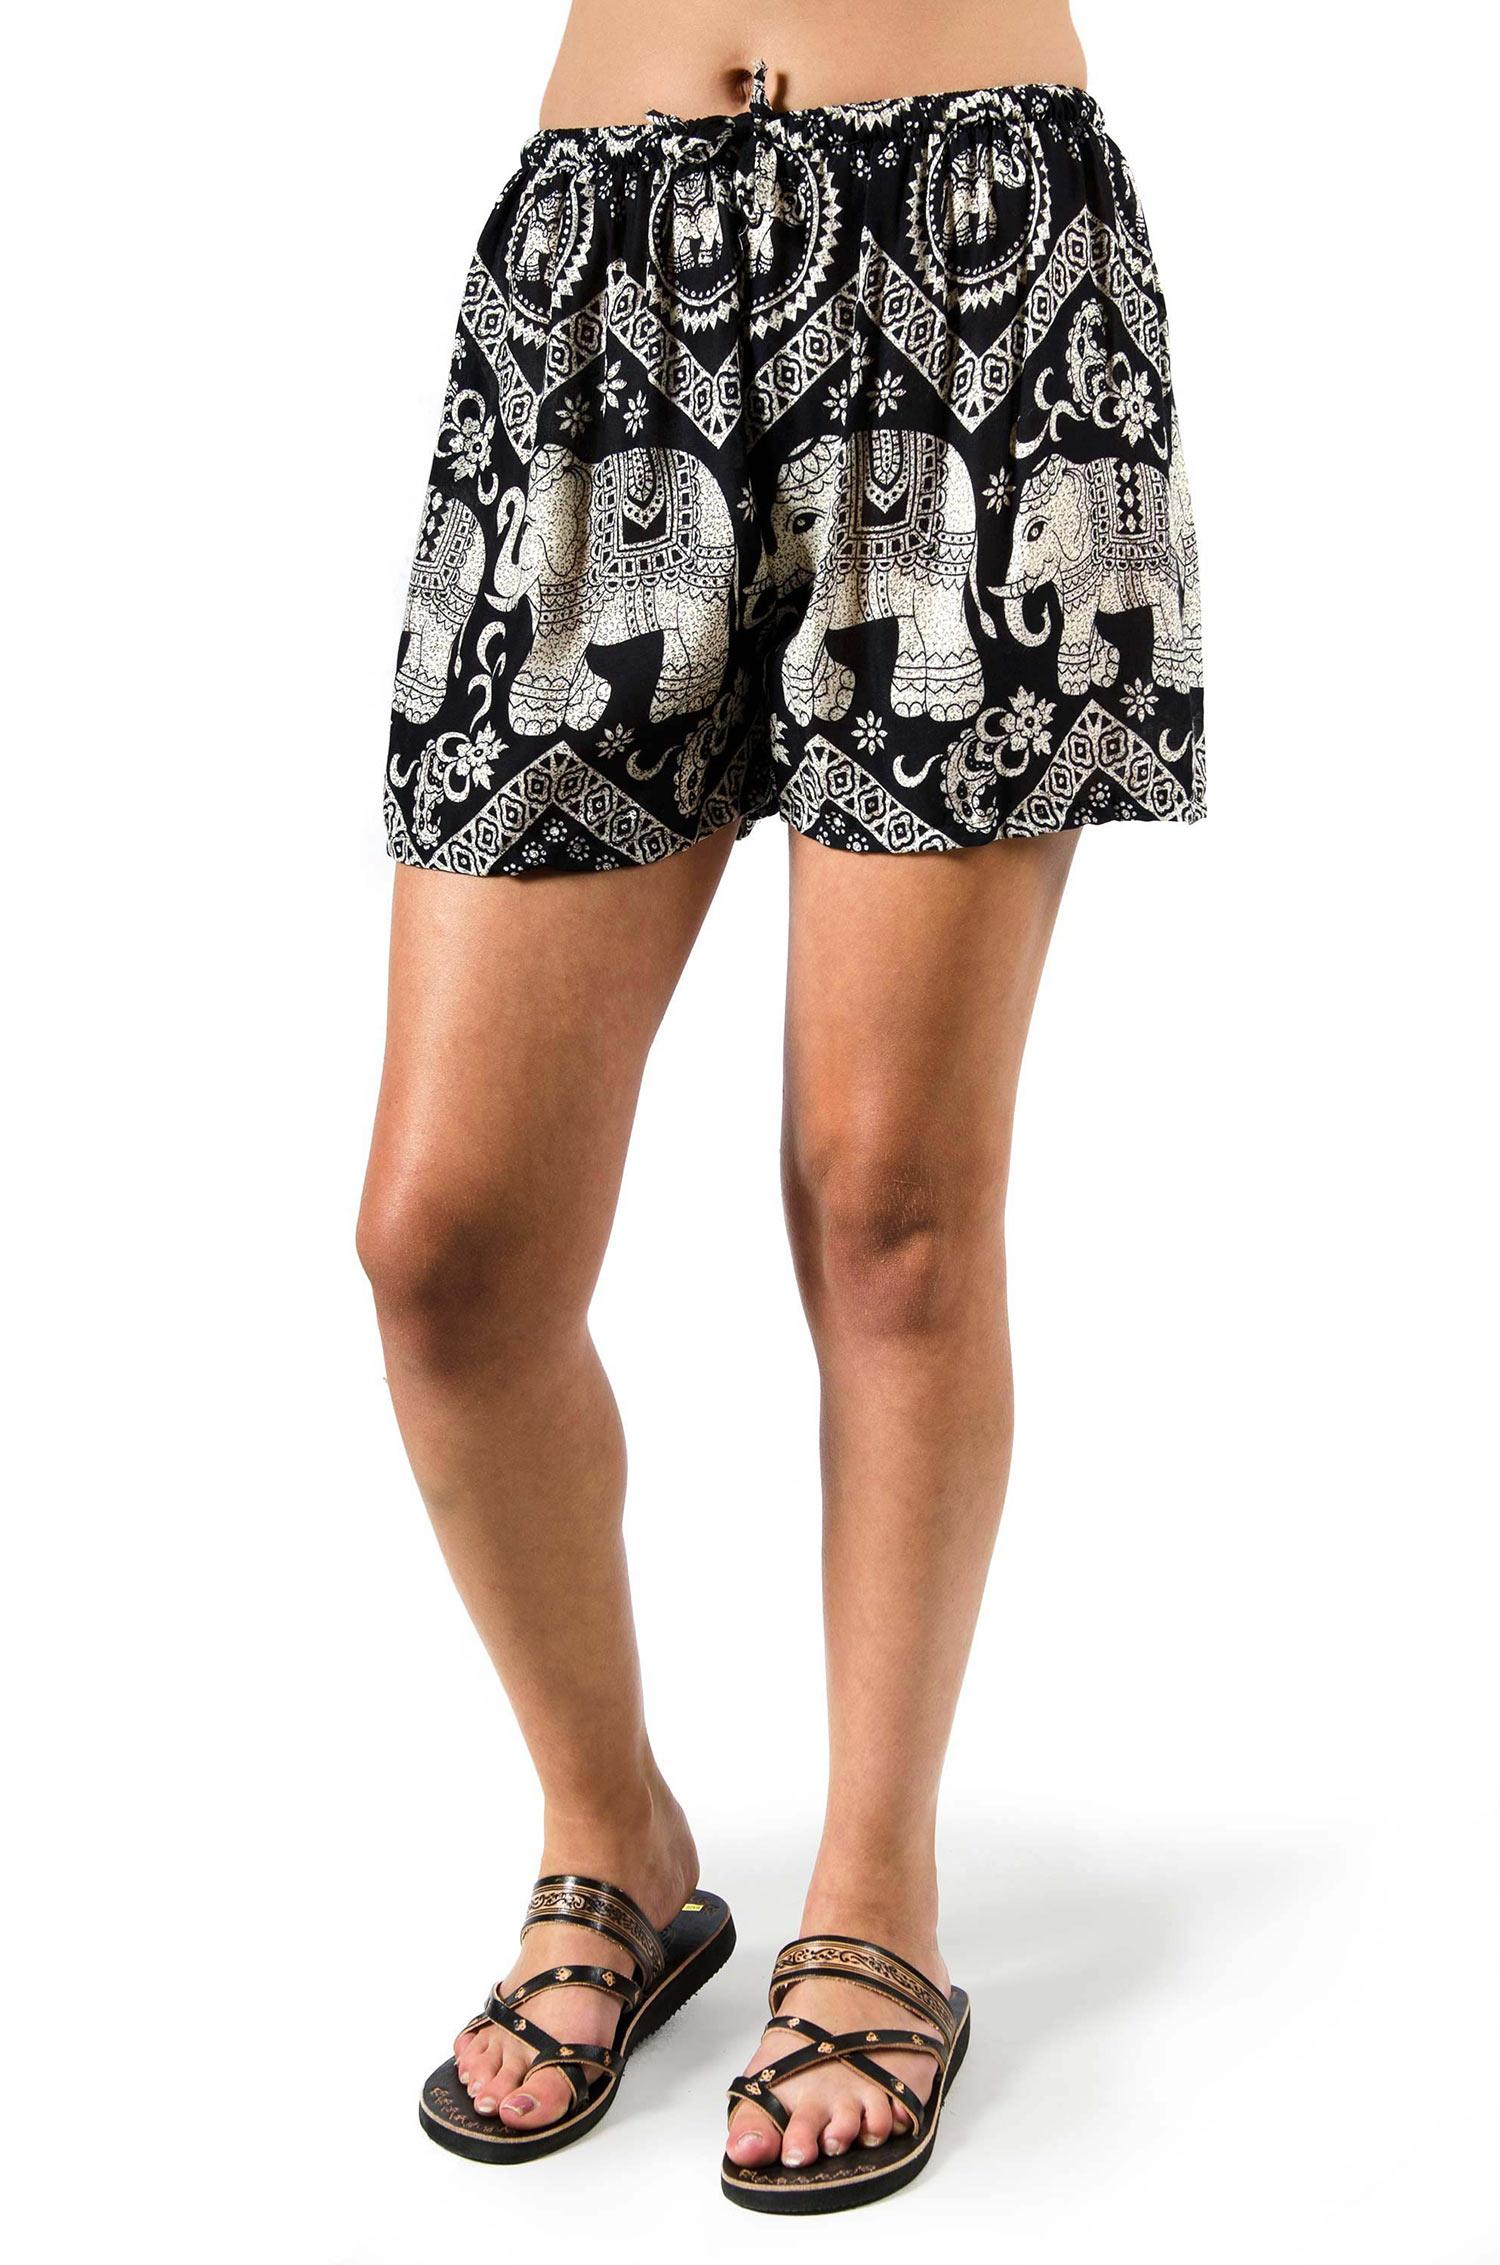 Elephant Print Shorts - Black - 3542K